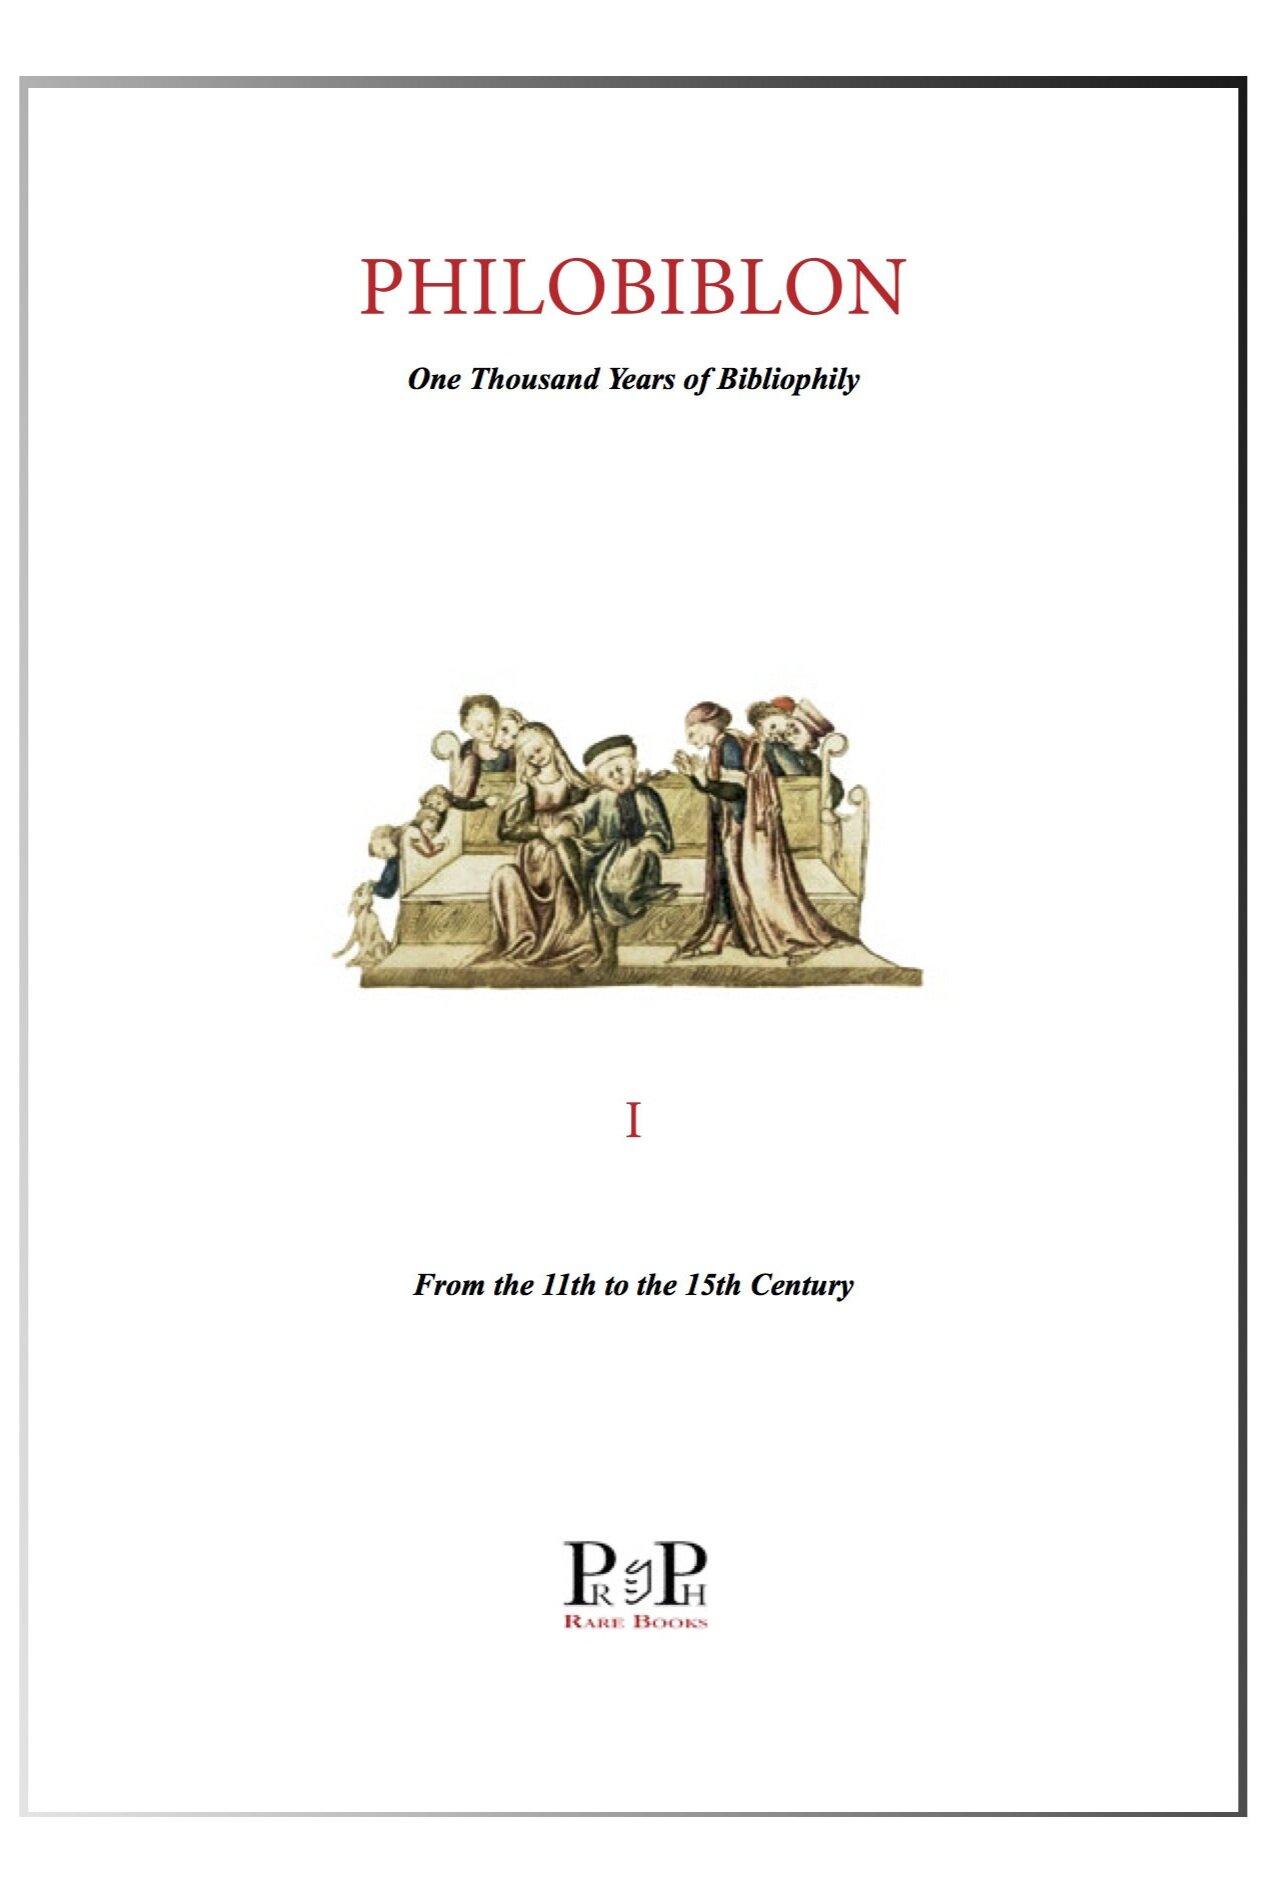 Philobiblon+Vol+1+-+cover+%281%29.jpg